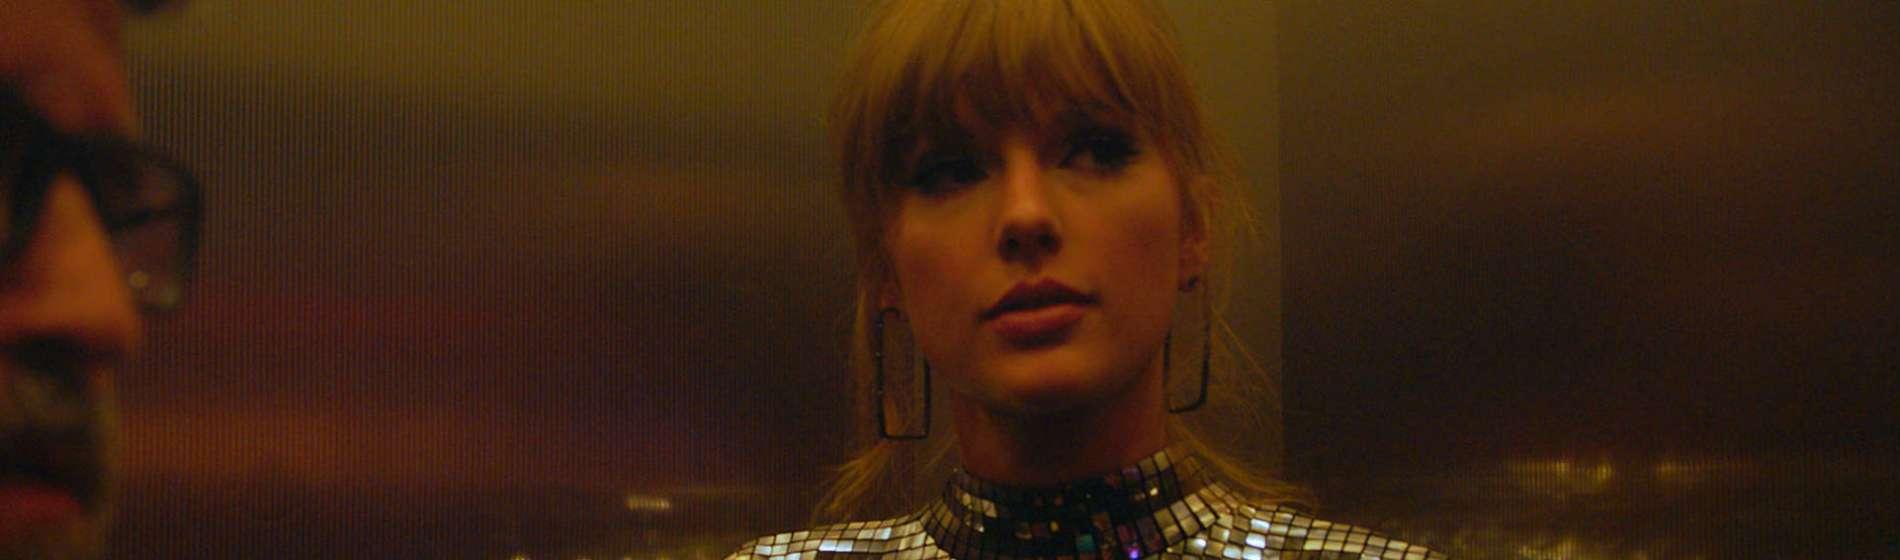 Sundance-Taylor Swift Miss America Feature Imagena